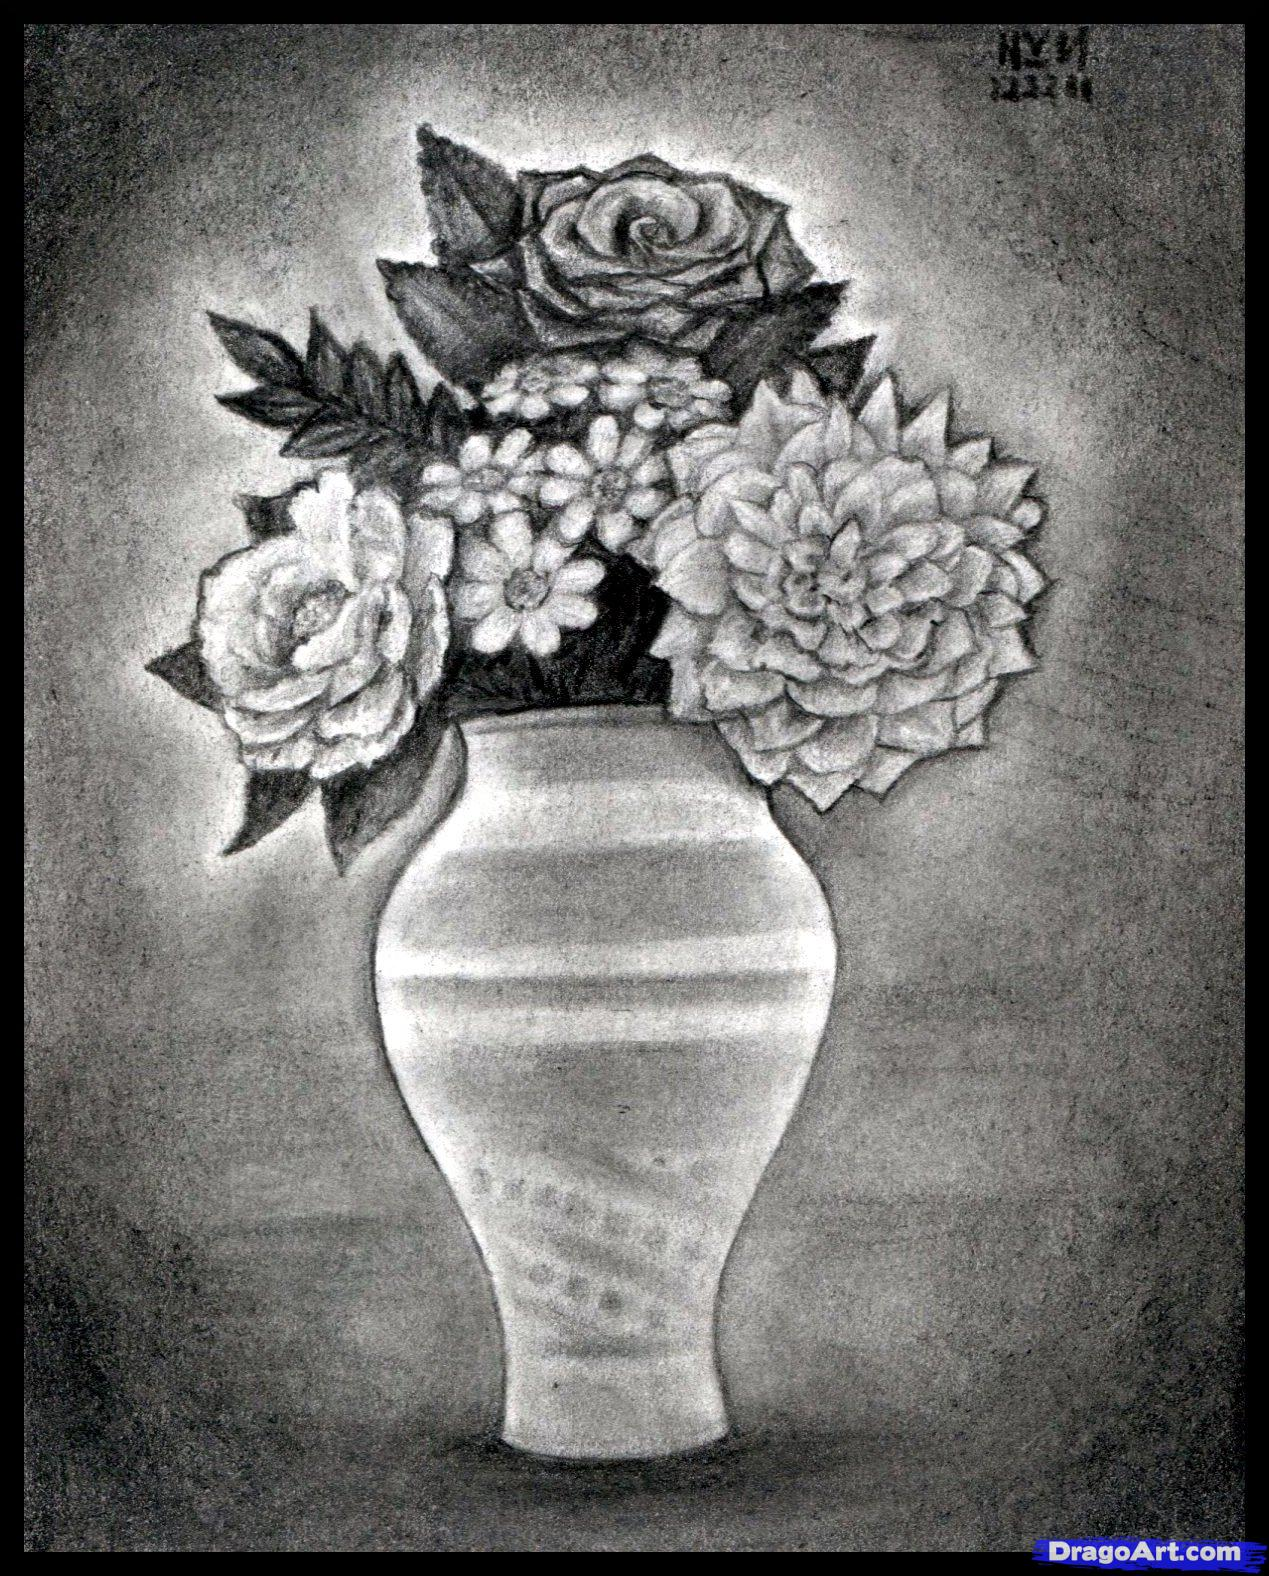 Drawn vase pencil drawing Pencils tumblr_o5azcteOoS1vpj9amo3_1280 Sketches Vase Pencils